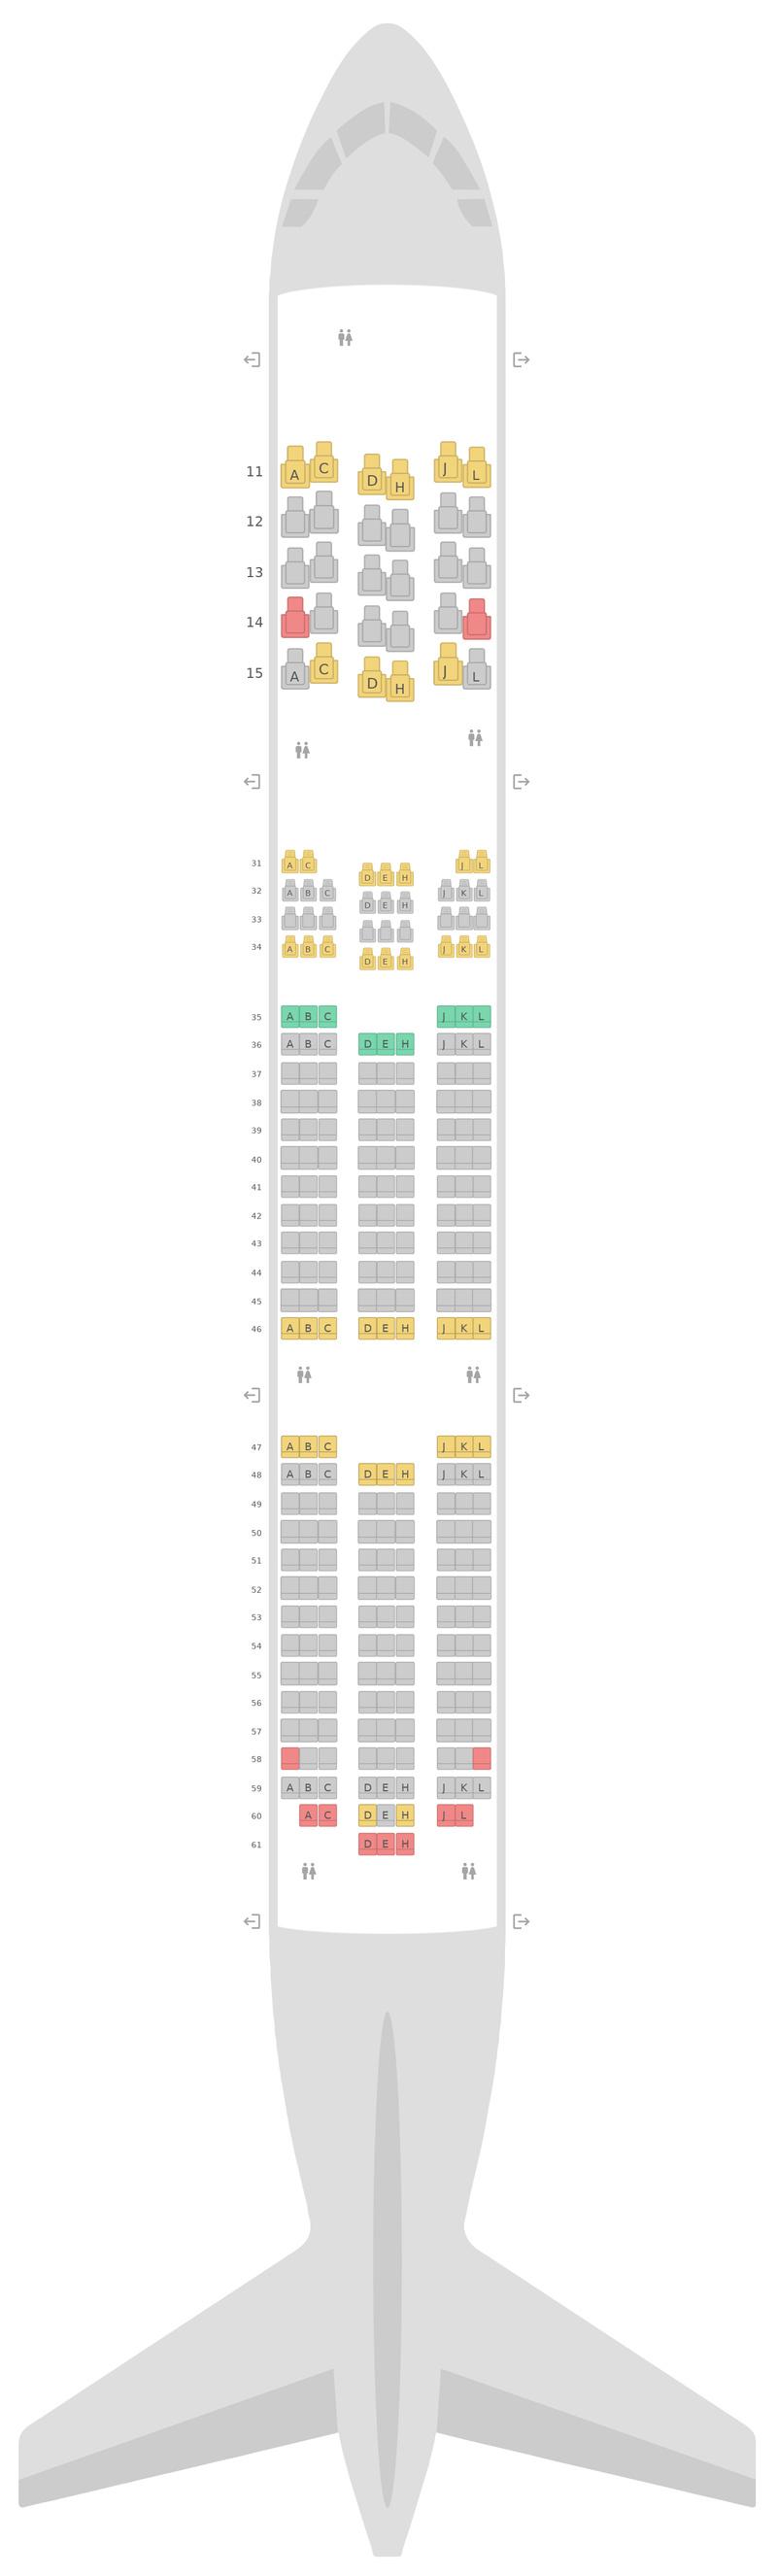 Схема салона Боинг 787-9 (789) Эйр Чайна